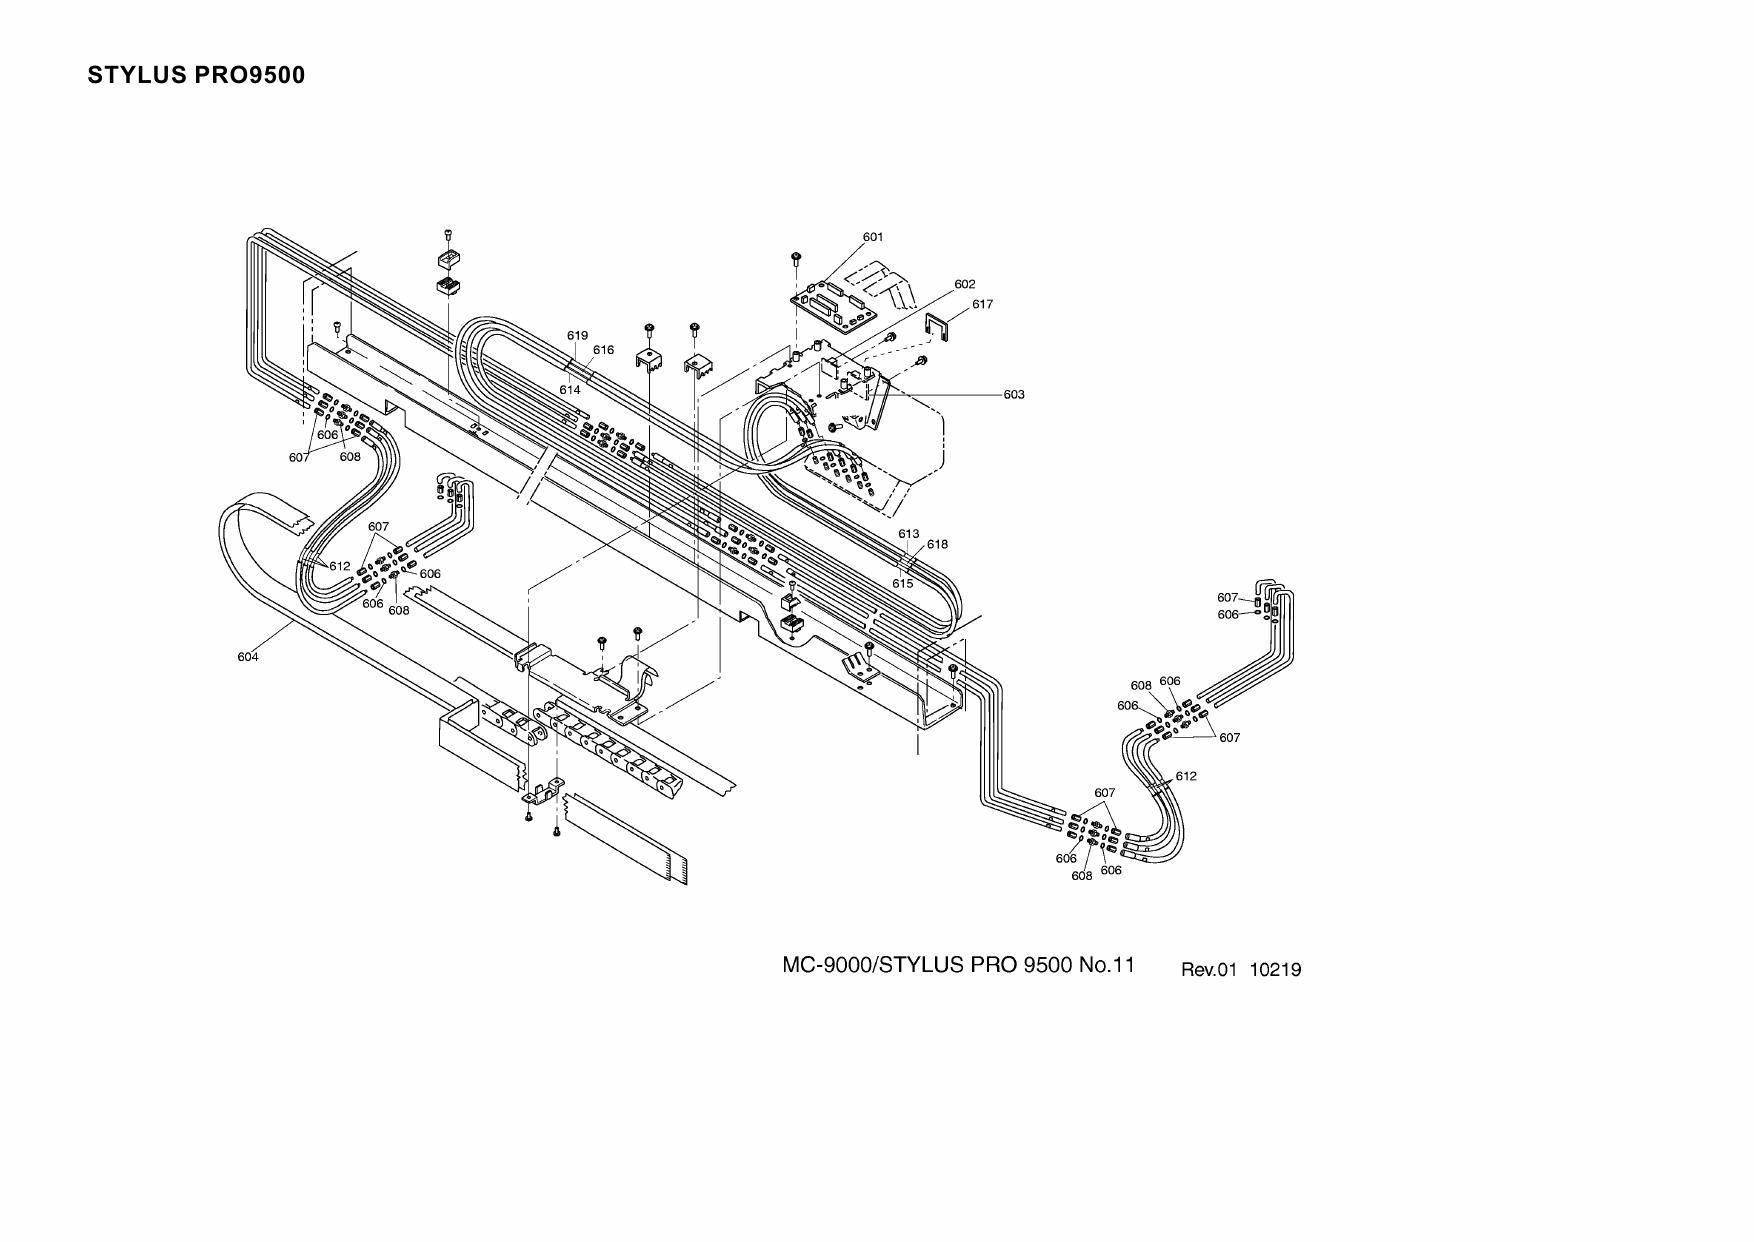 epson stylus pro 4800 service manual pdf